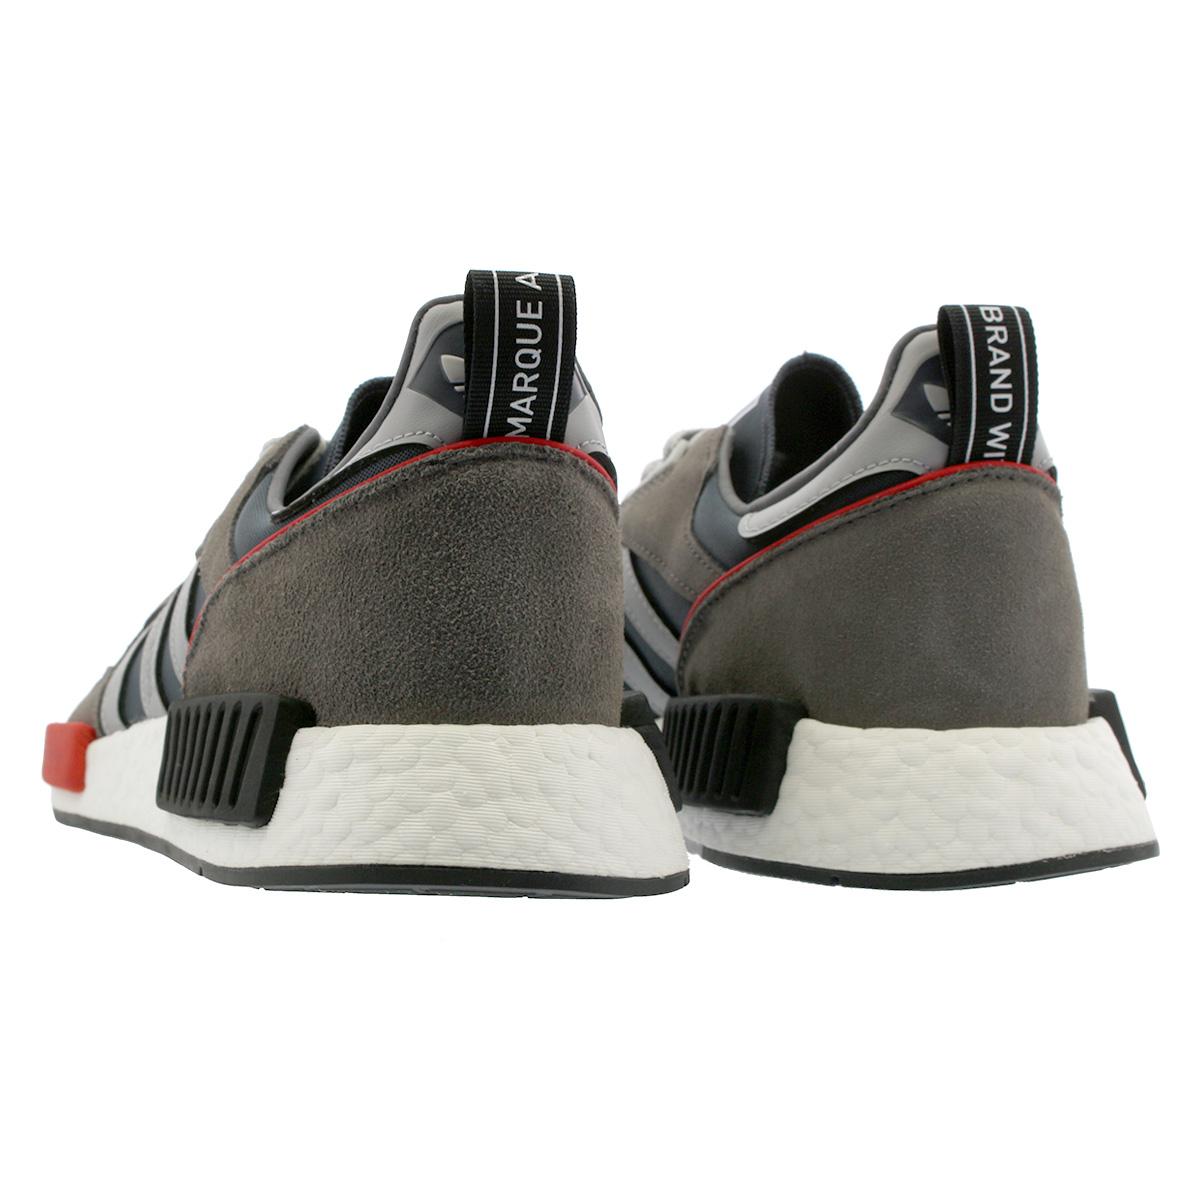 f91e72560 LOWTEX PLUS  adidas BOSTONSUPER x R1 Adidas Boston supermarket x R1 BOLD  ONIX CLEAR ONIX RUNNING WHITE g26776